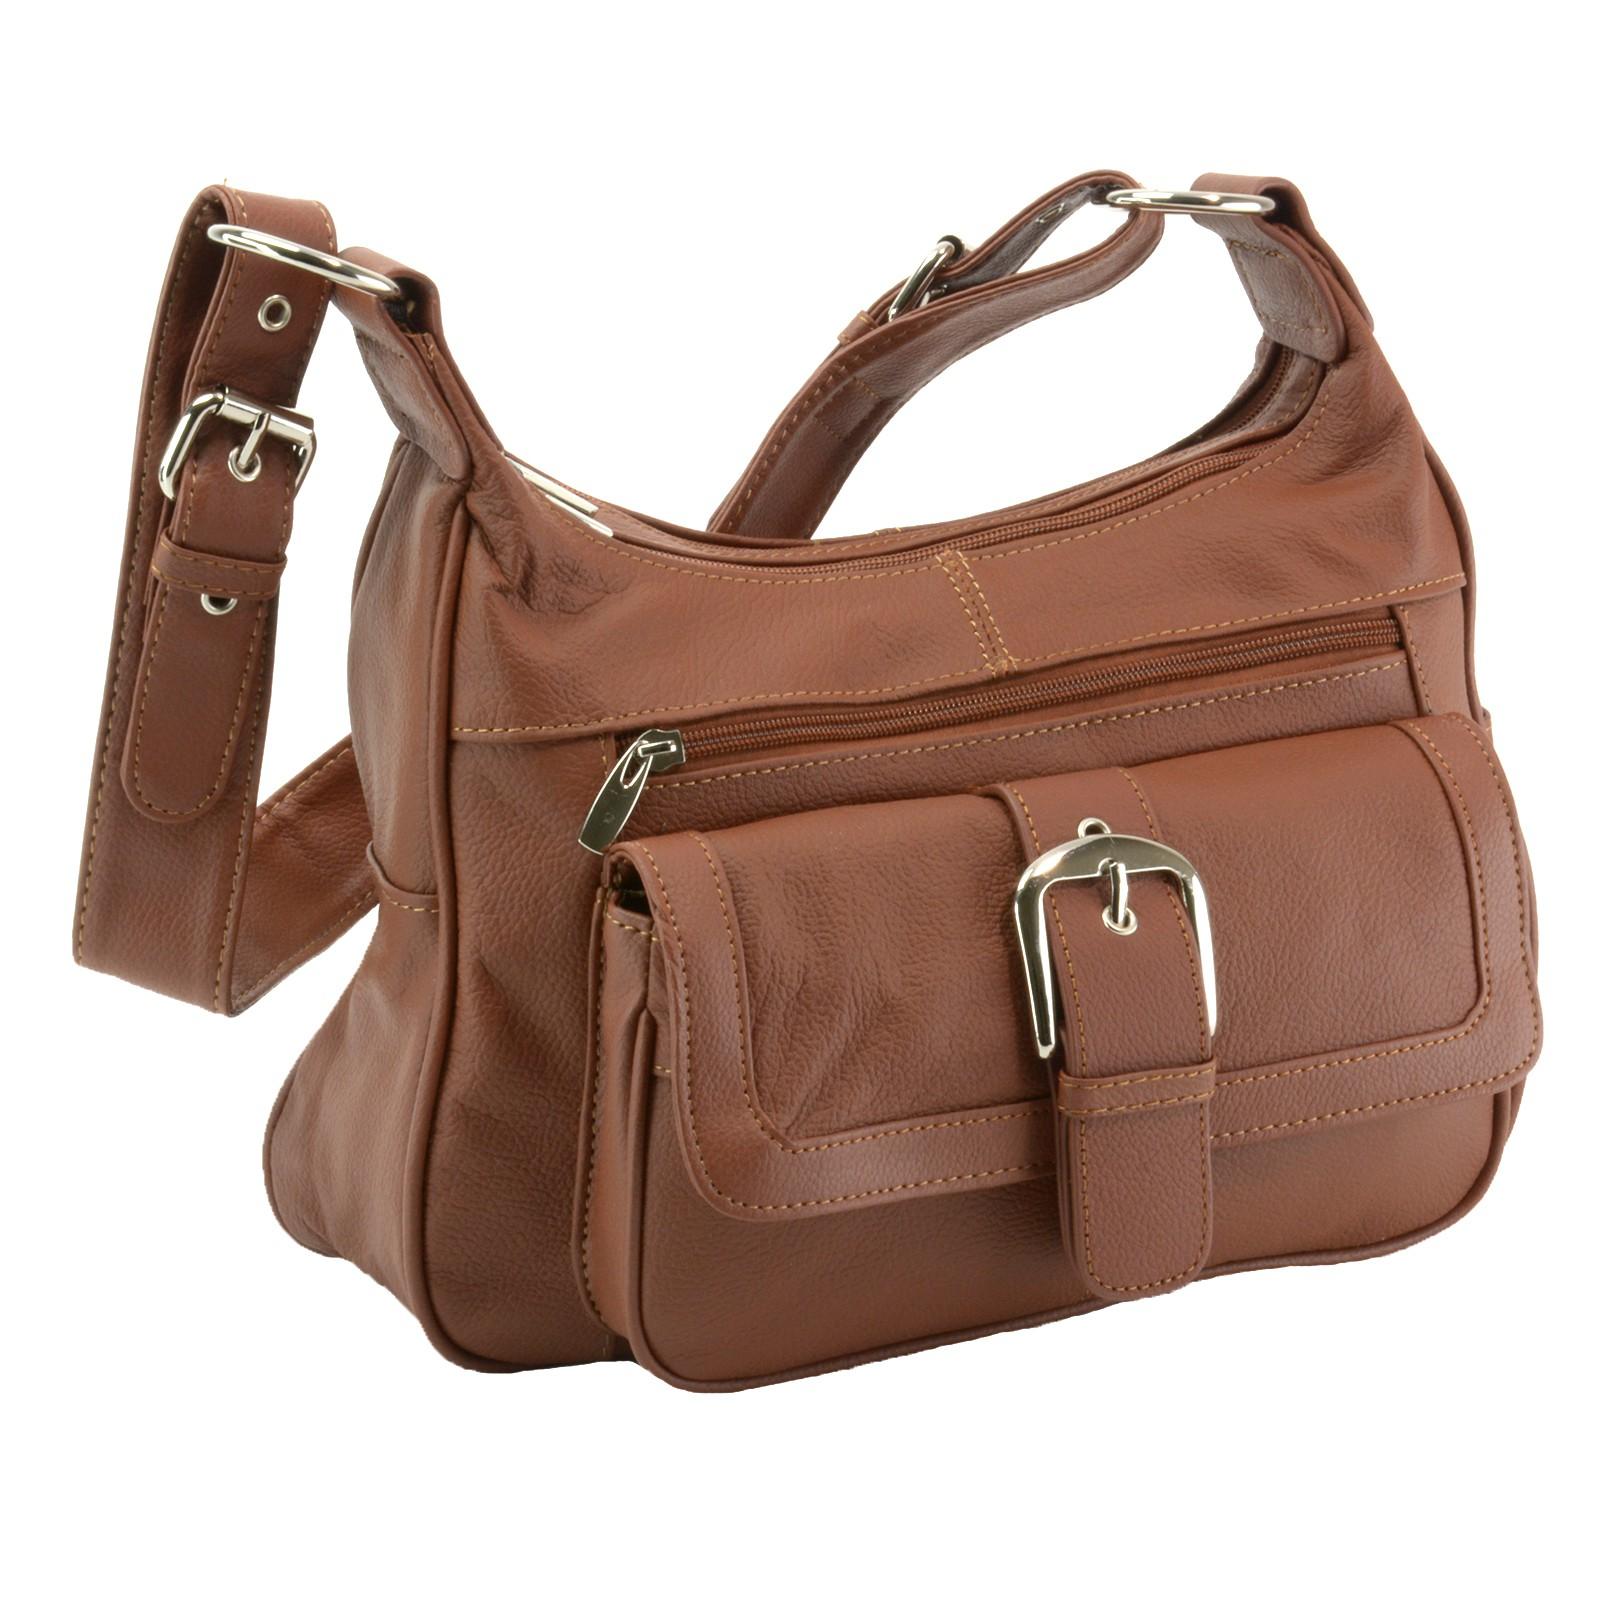 0c589a3817d6 Women s Leather Organizer Purse Multi Pocket Handbag Shoulder Bag .